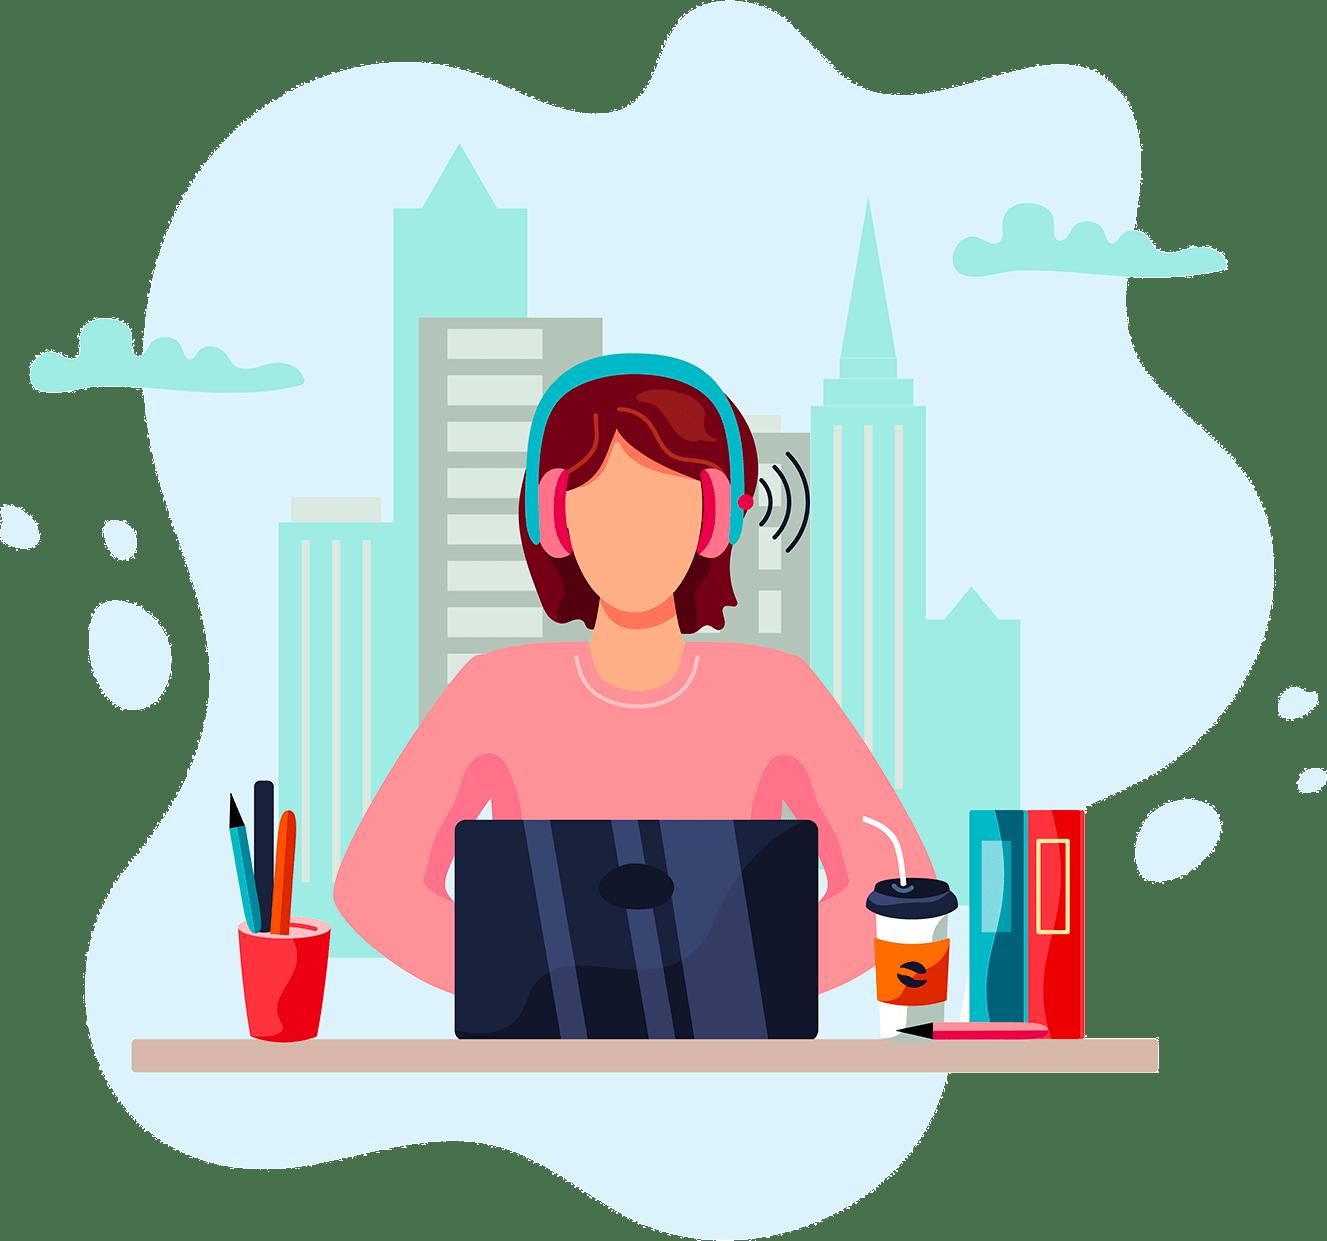 https://saletancy.com/wp-content/uploads/2021/08/call-center-services.png